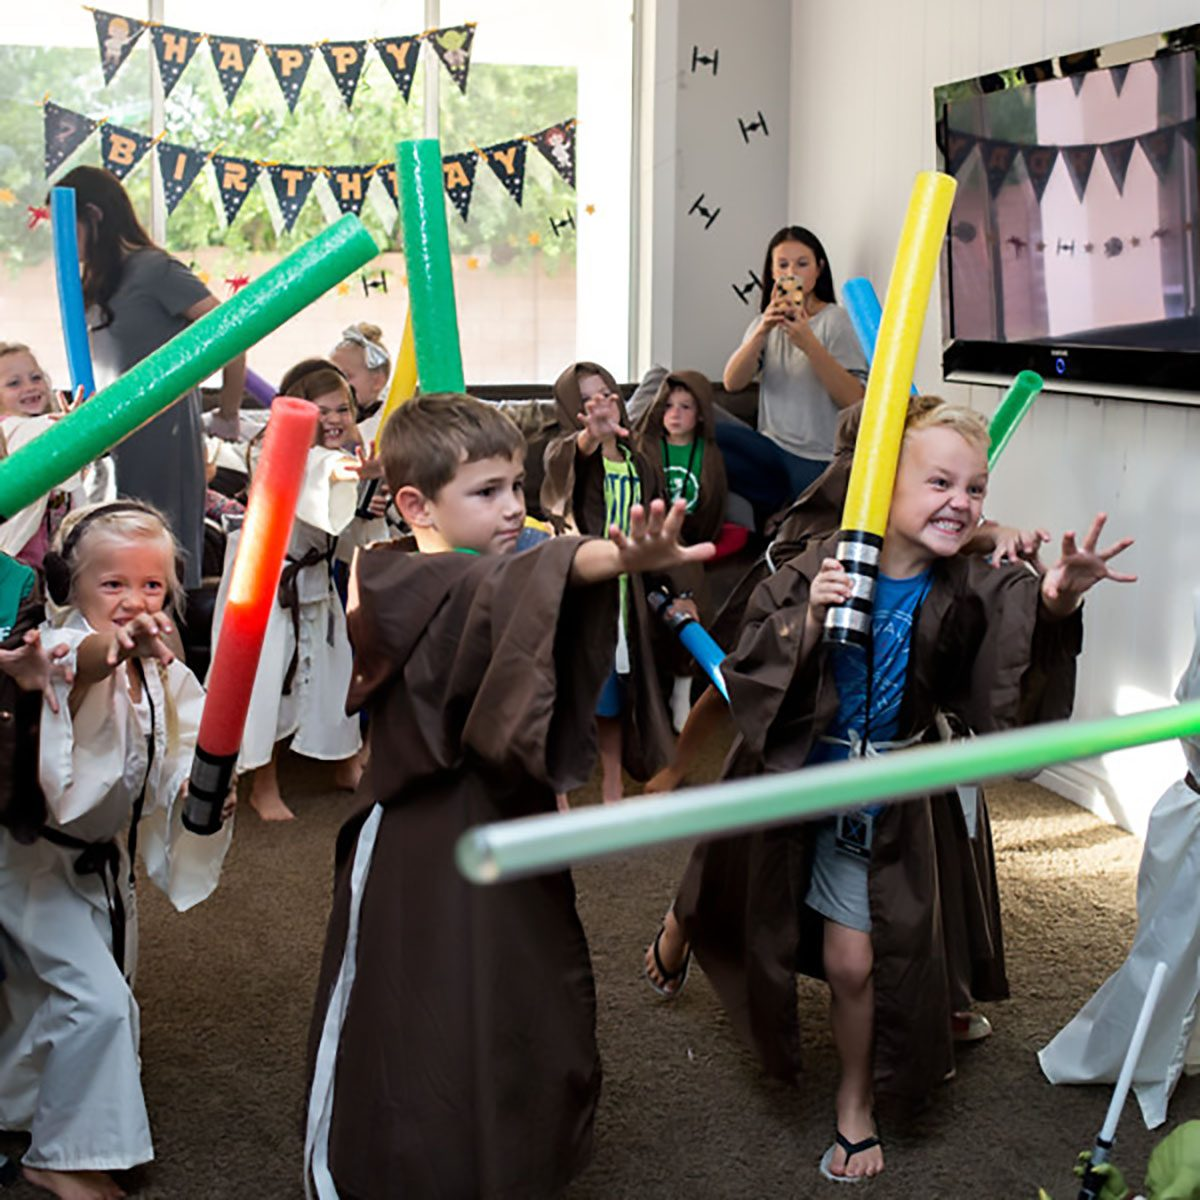 Star Wars Birthday Party lightsaber fight idea